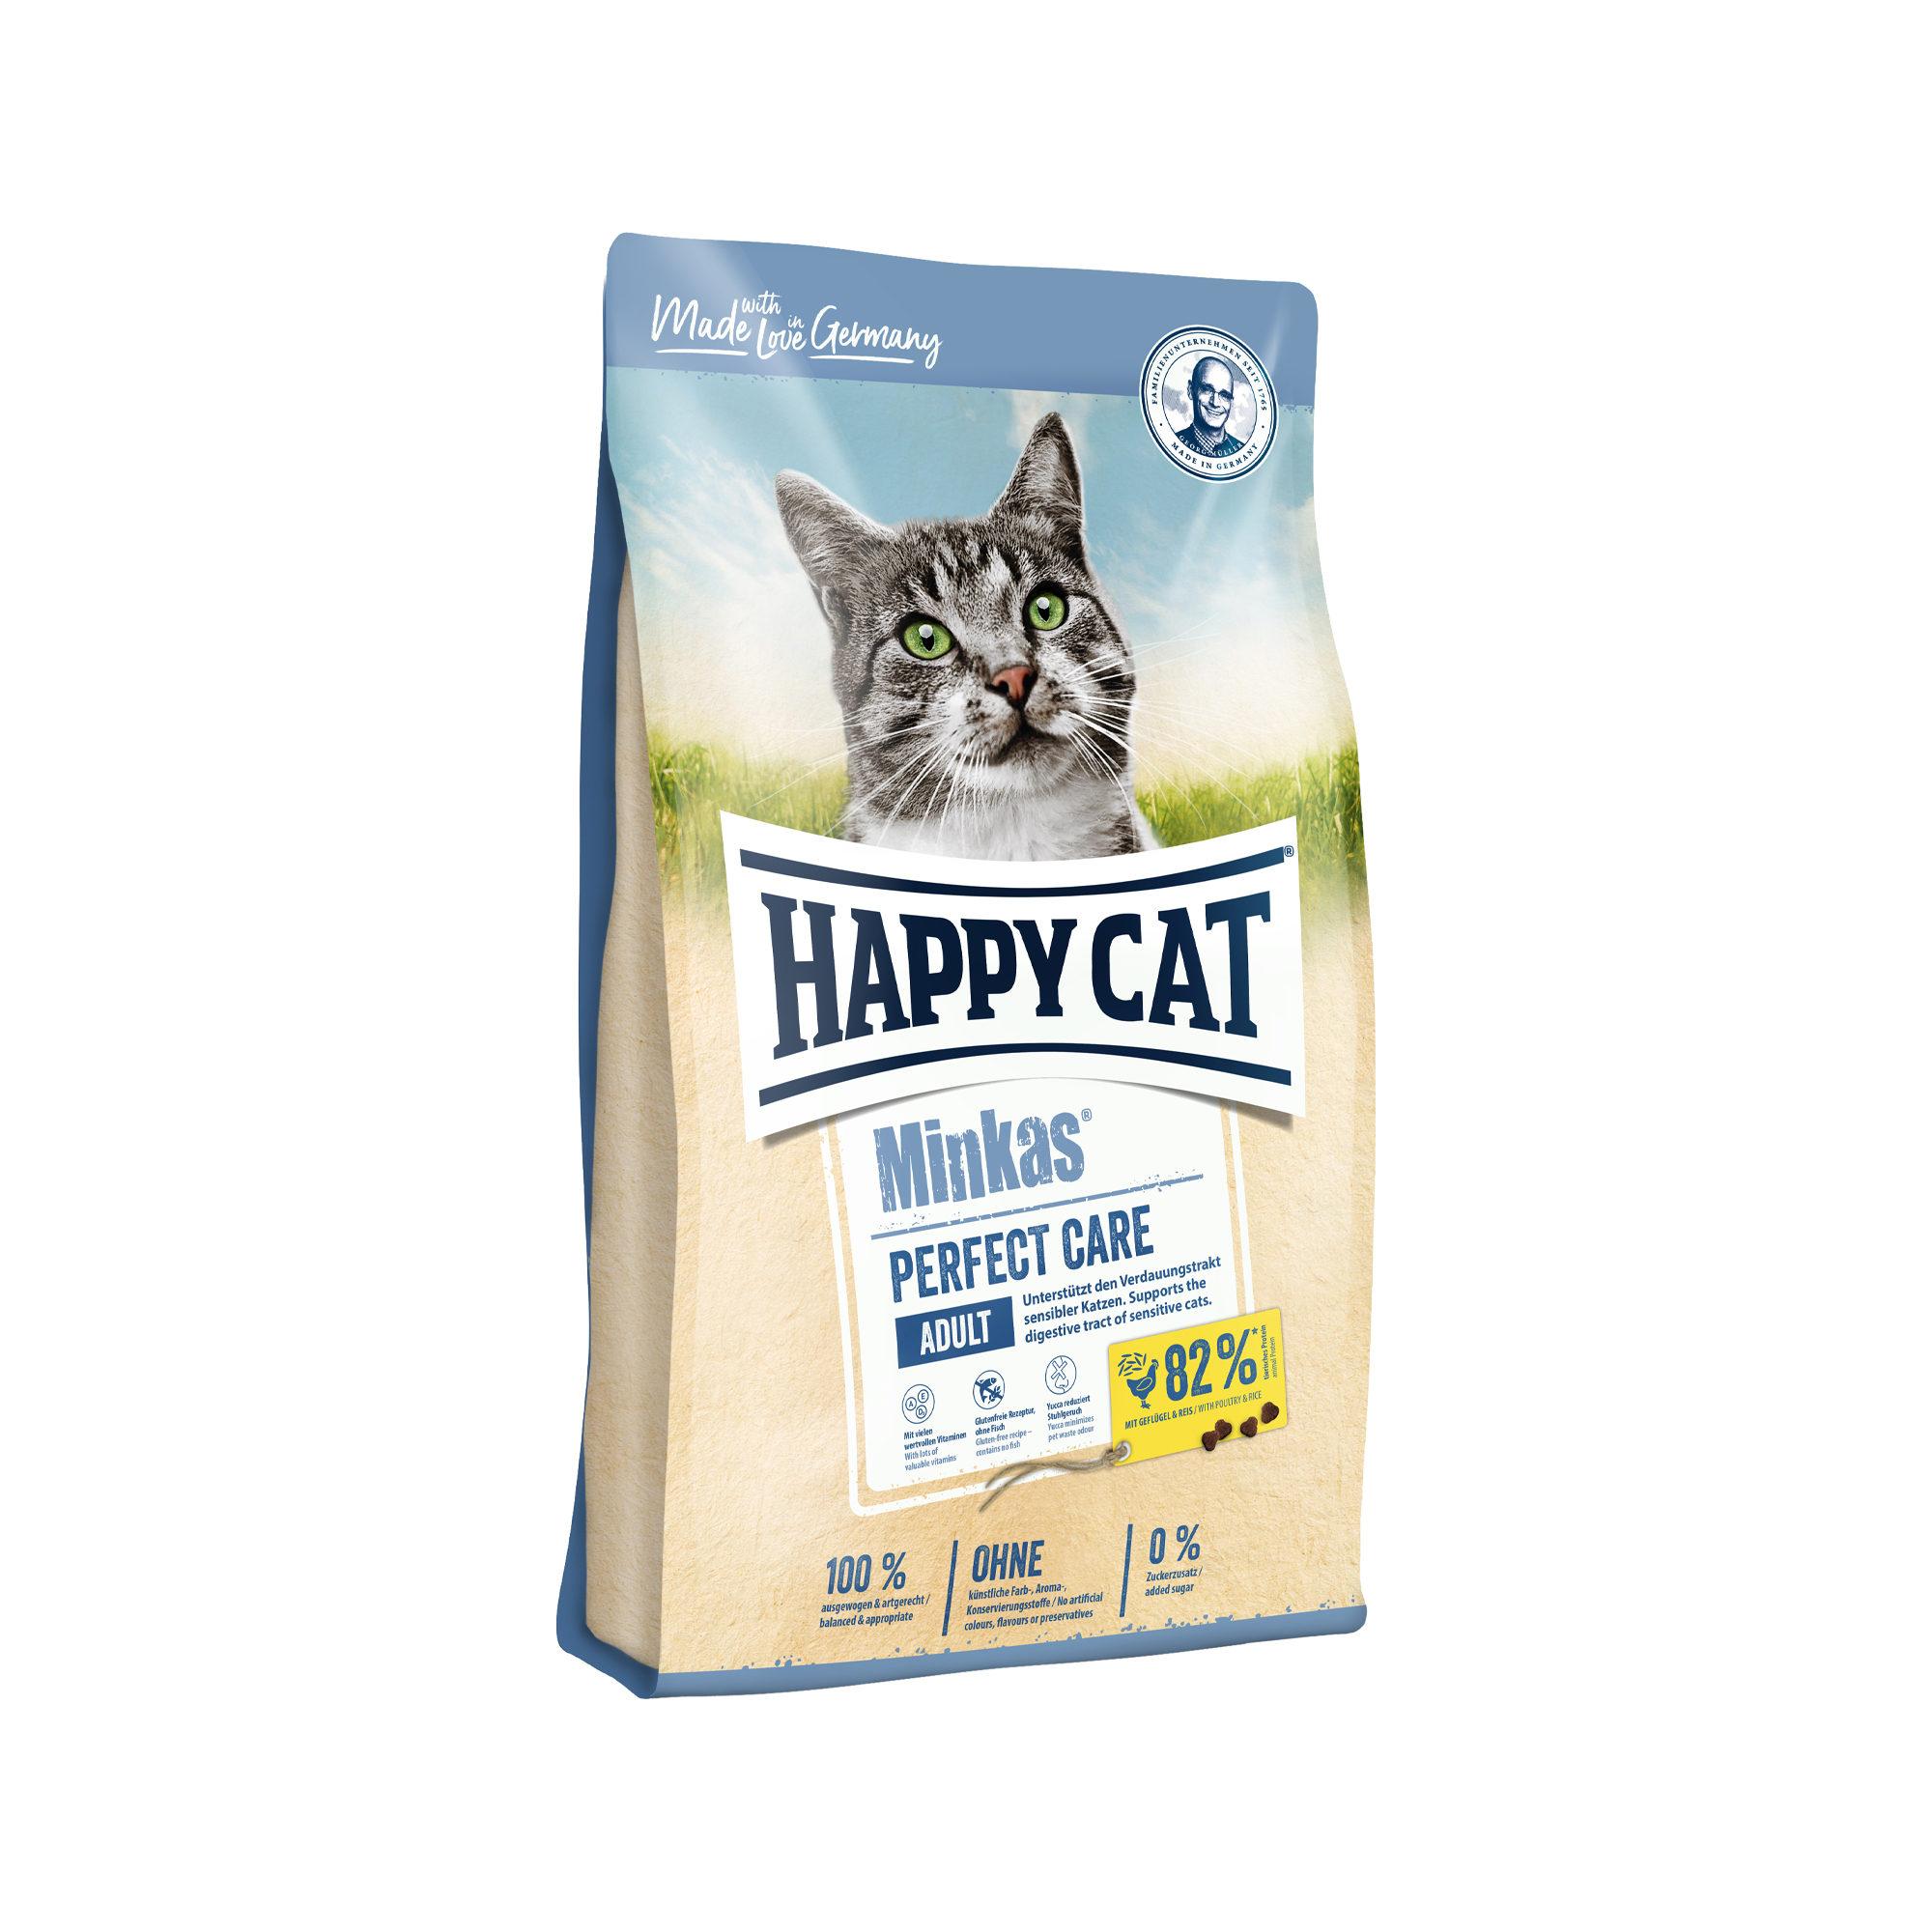 Happy Cat Minkas Adult Perfect Care Katzenfutter - Geflügel & Reis